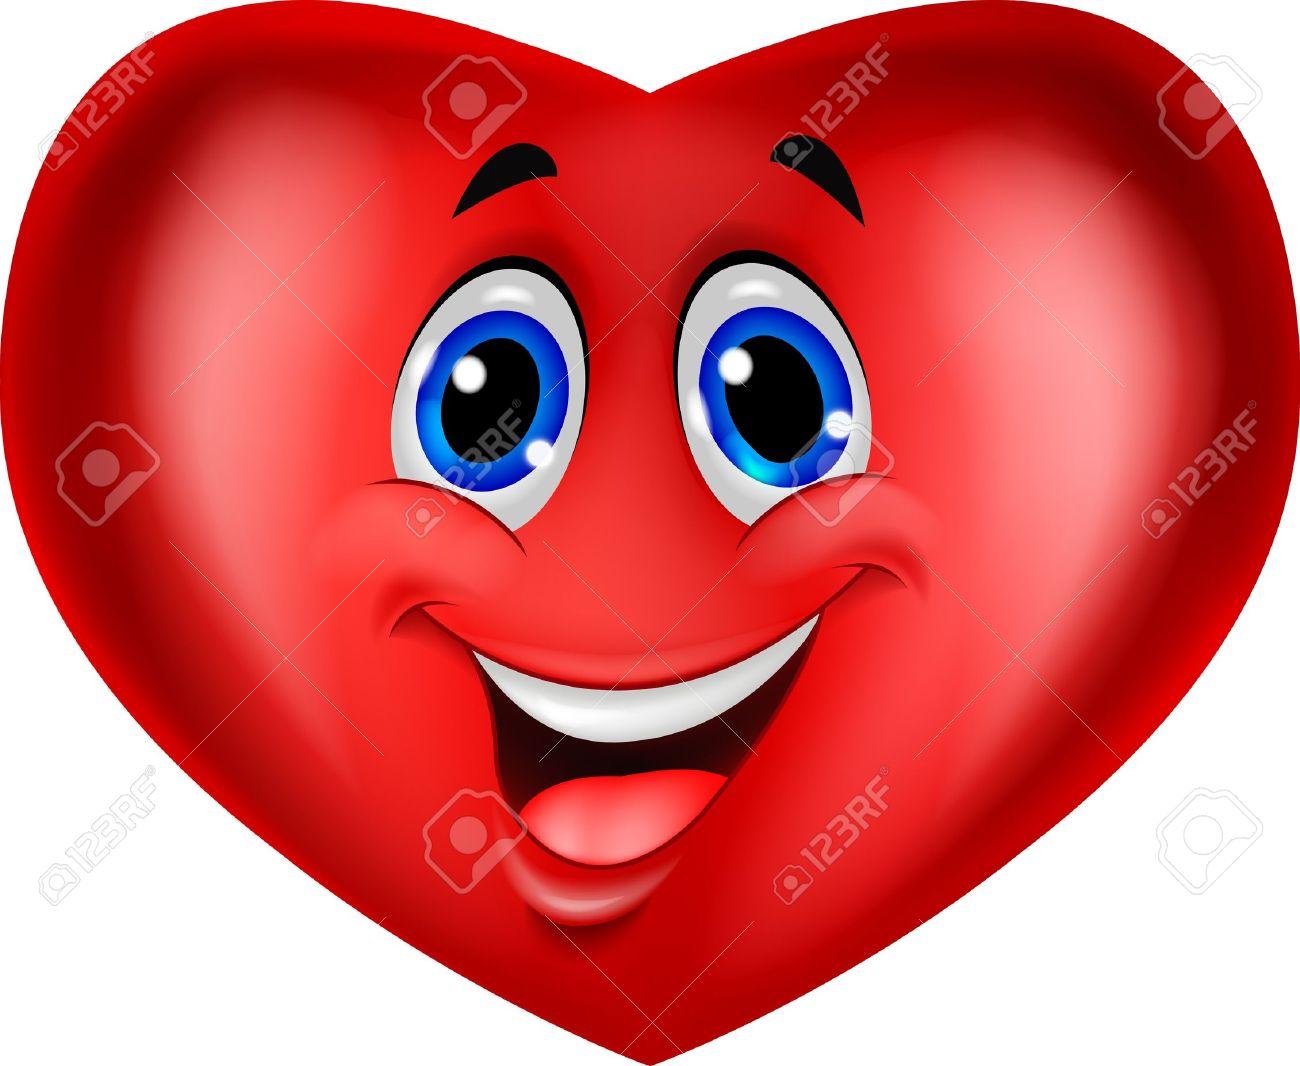 Cute smiling heart symbol royalty free cliparts vectors and cute smiling heart symbol stock vector 17697020 buycottarizona Images